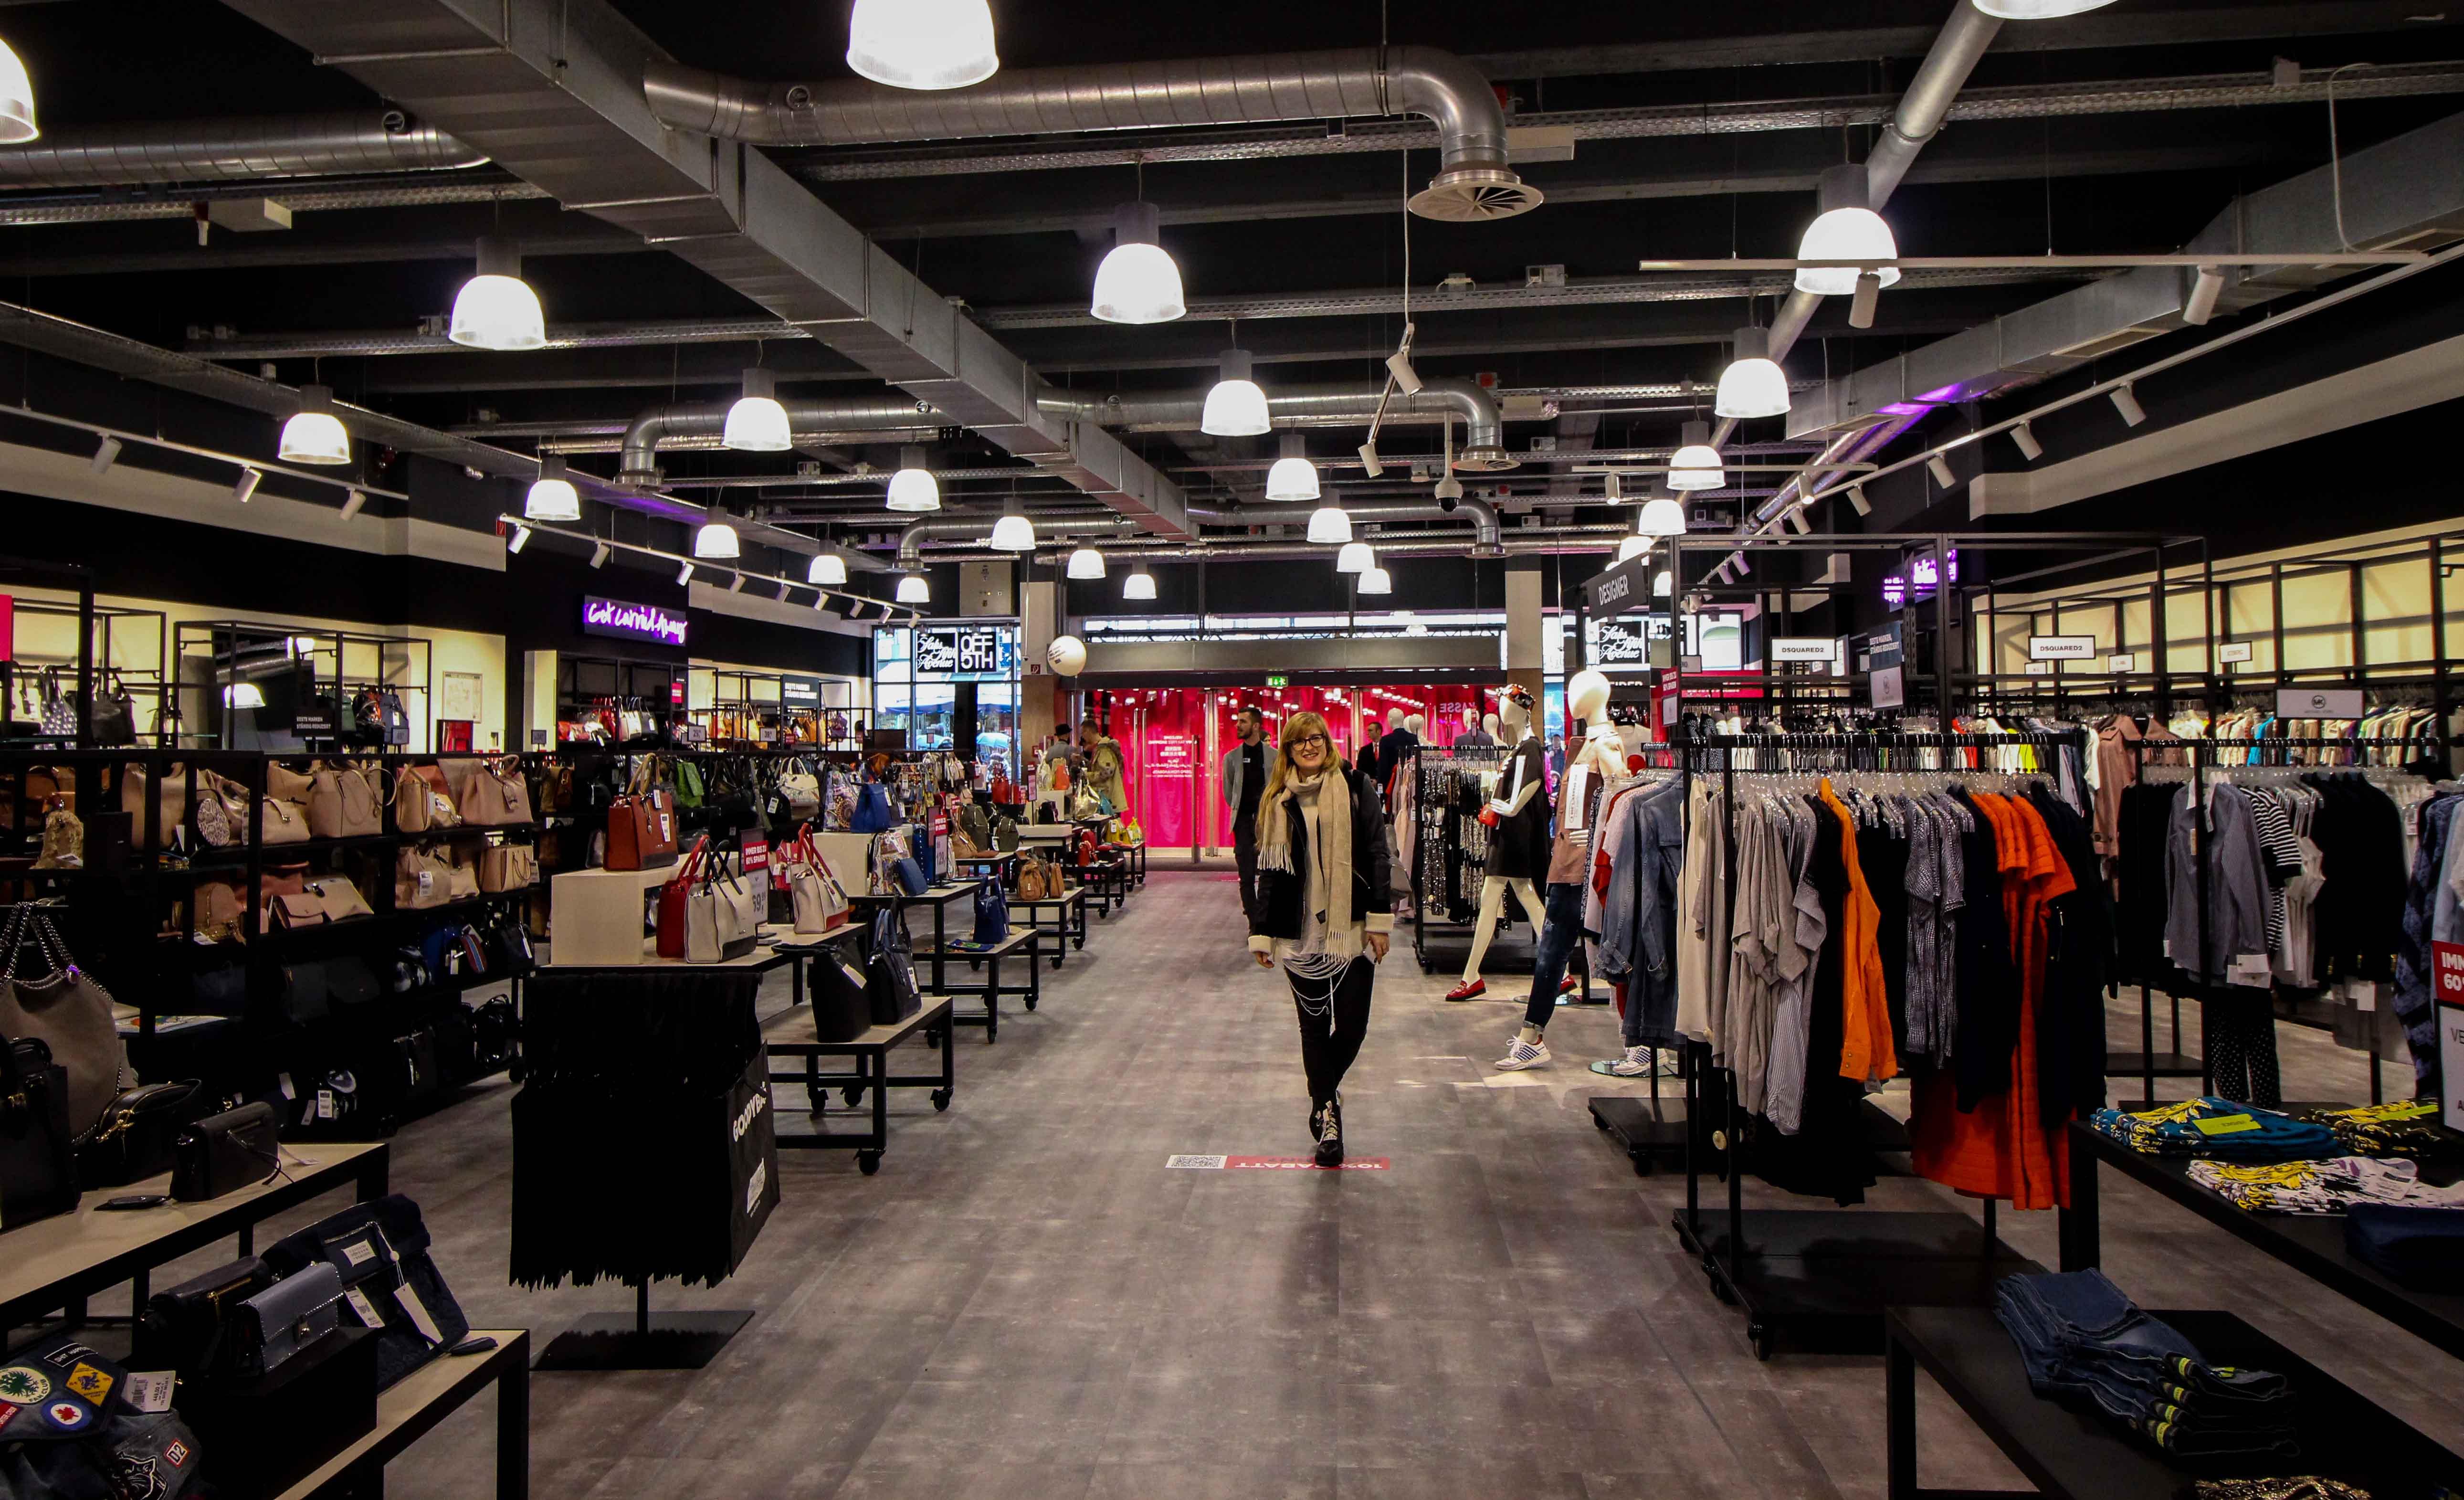 Store Opening Saks OFF 5th Avenue Bonn Premium-Marken Outletpreis Designer Outlet Bonn Modeblog Einrichtung